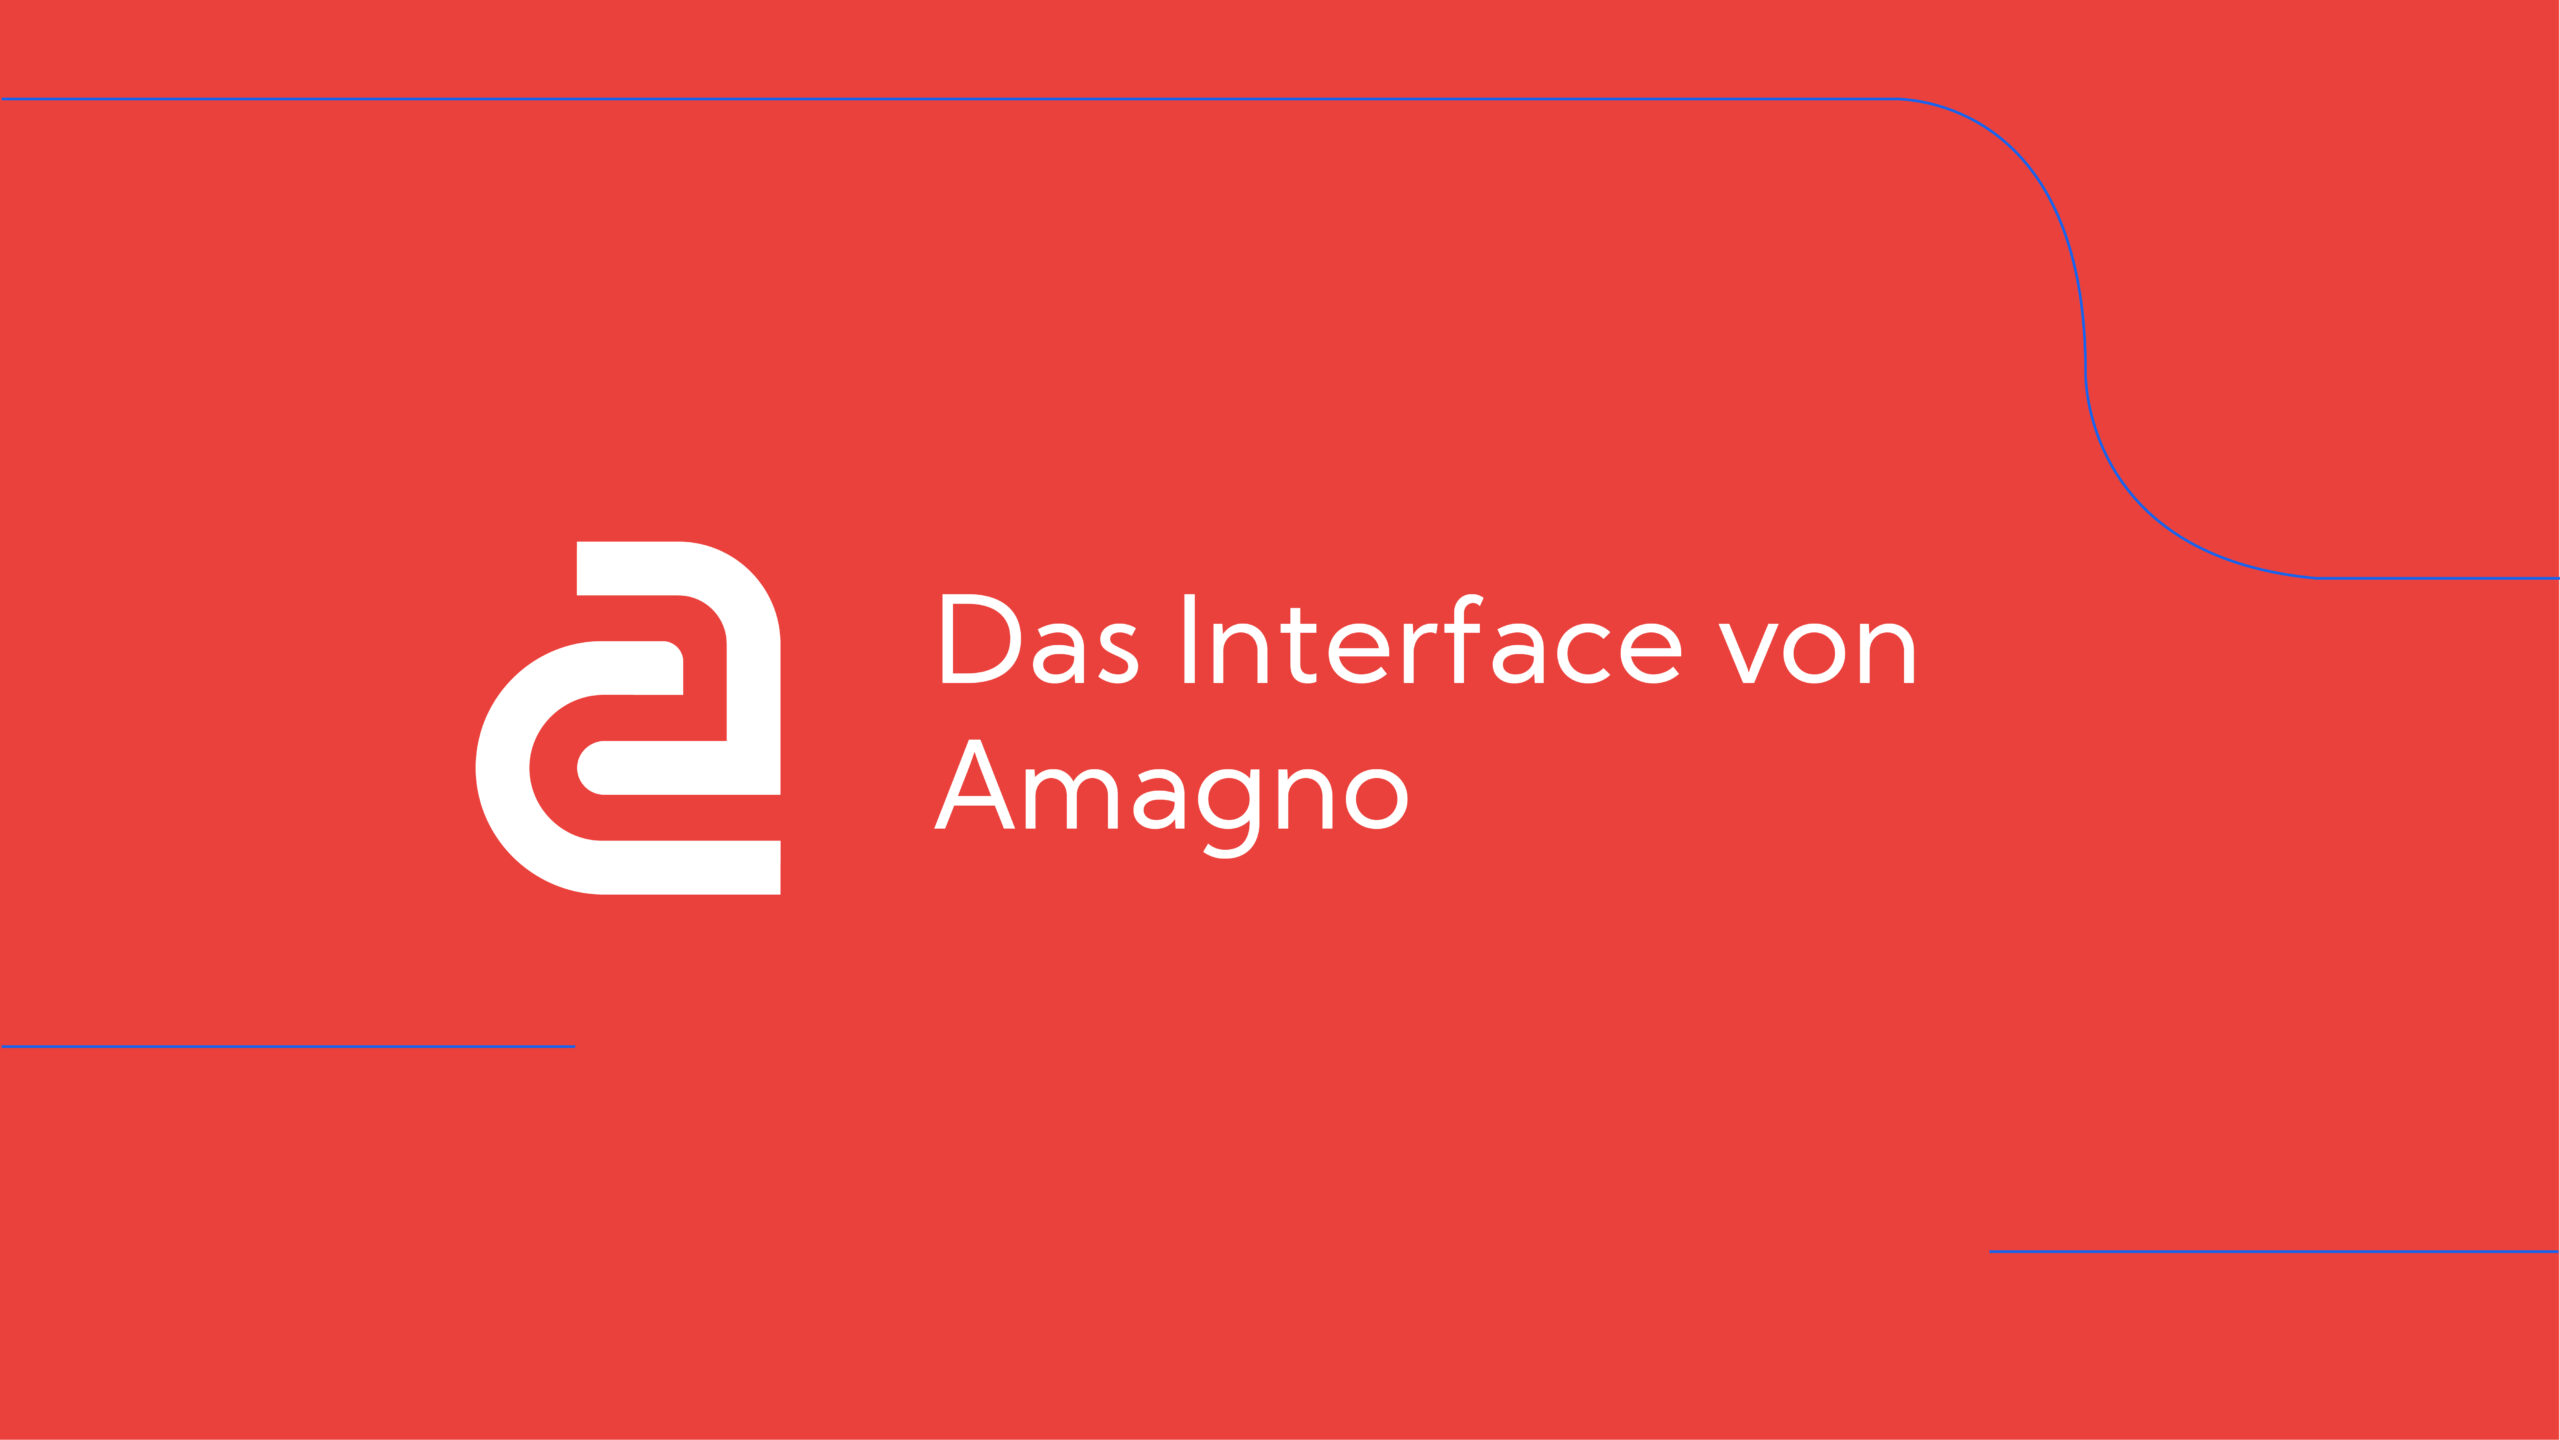 How-To: Amagno Basics – Das Interface